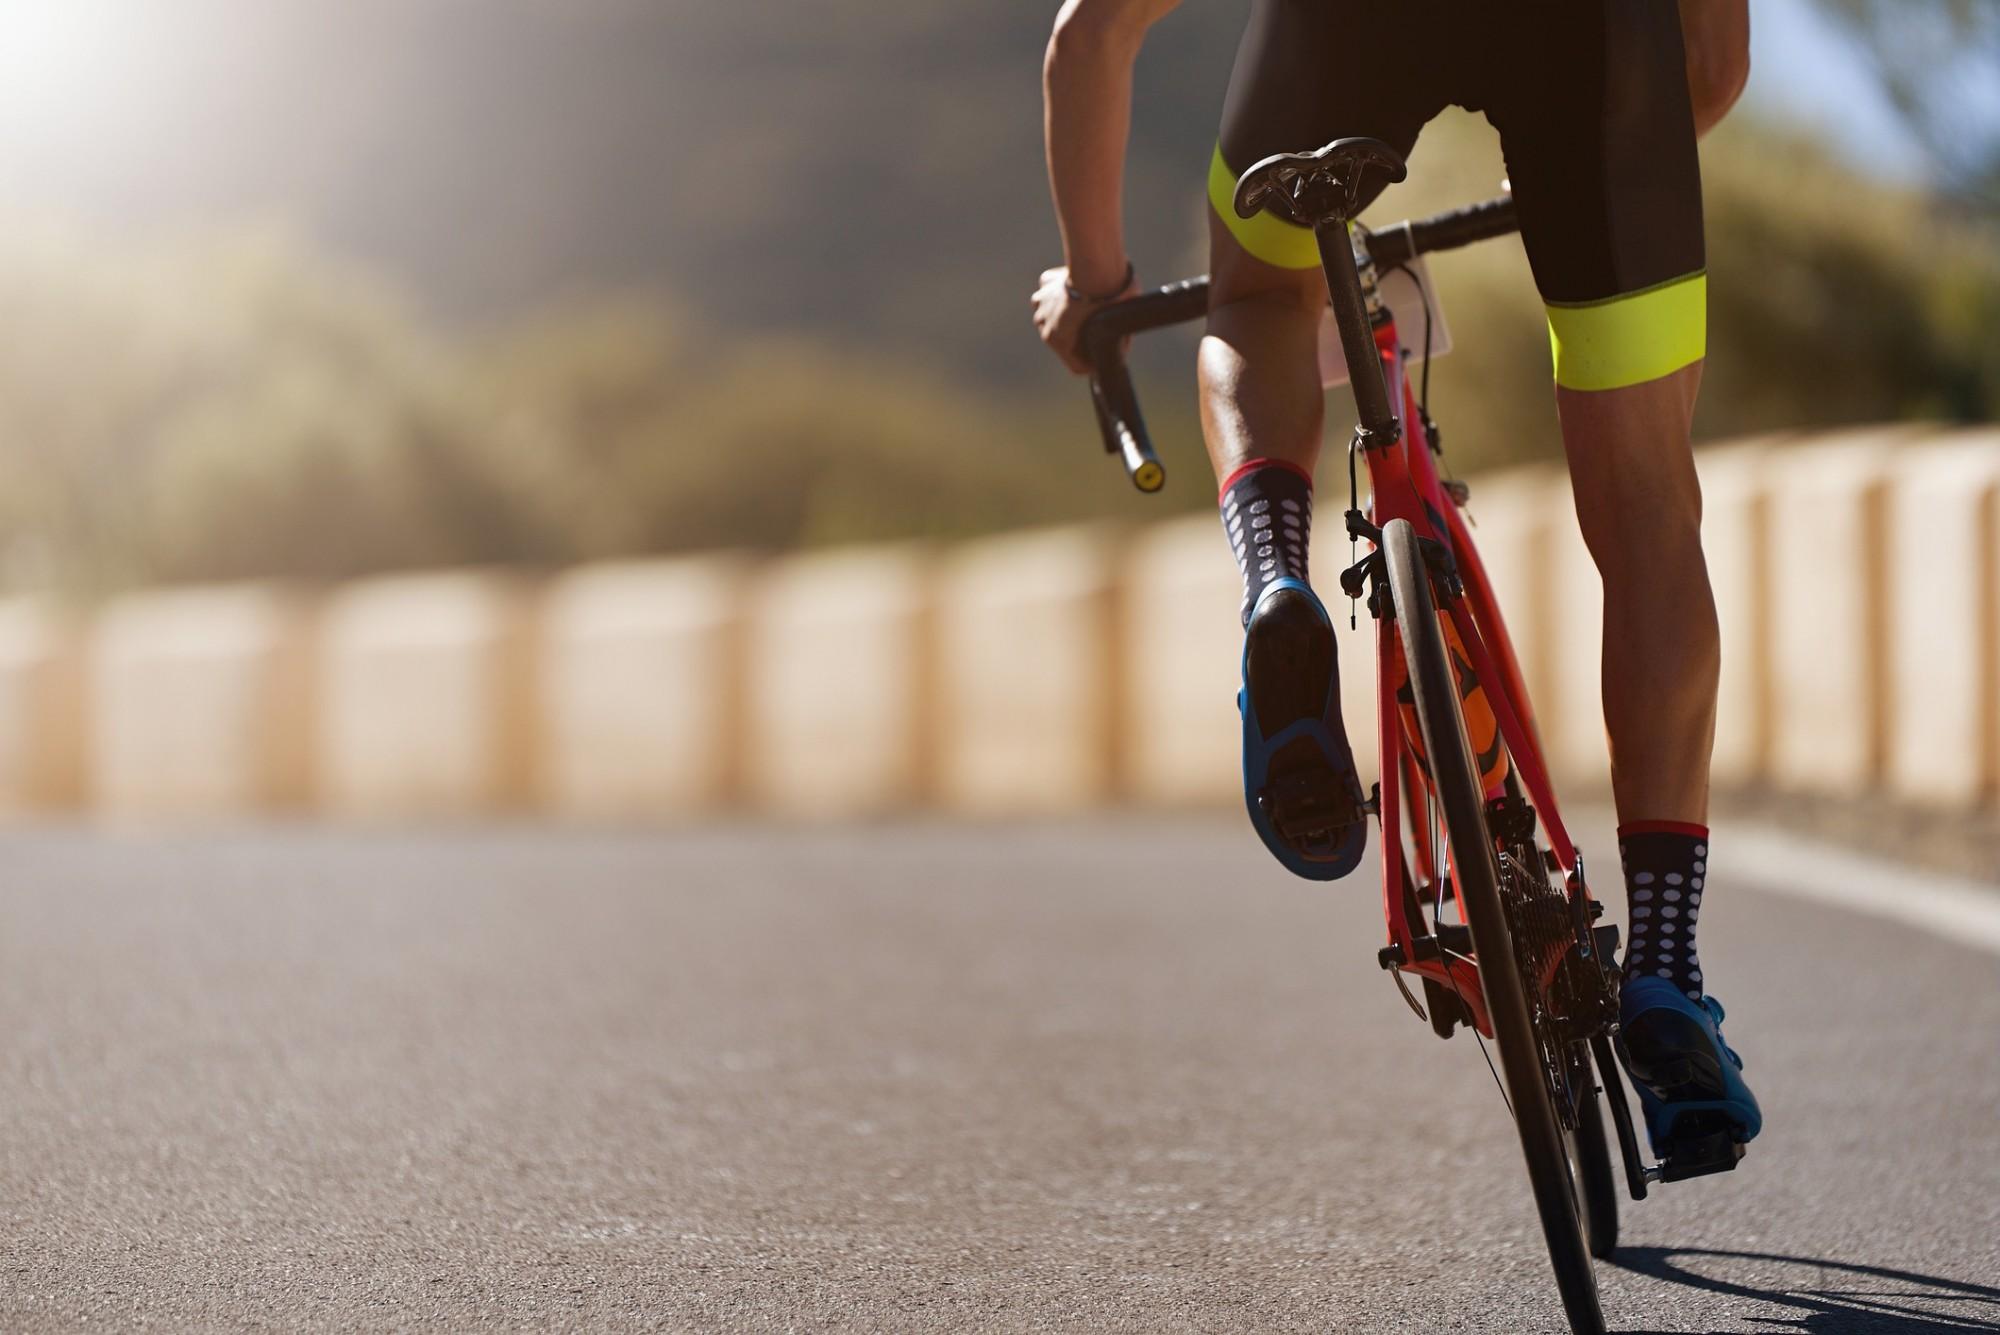 A man sprints on a road bike, riding towards the sun